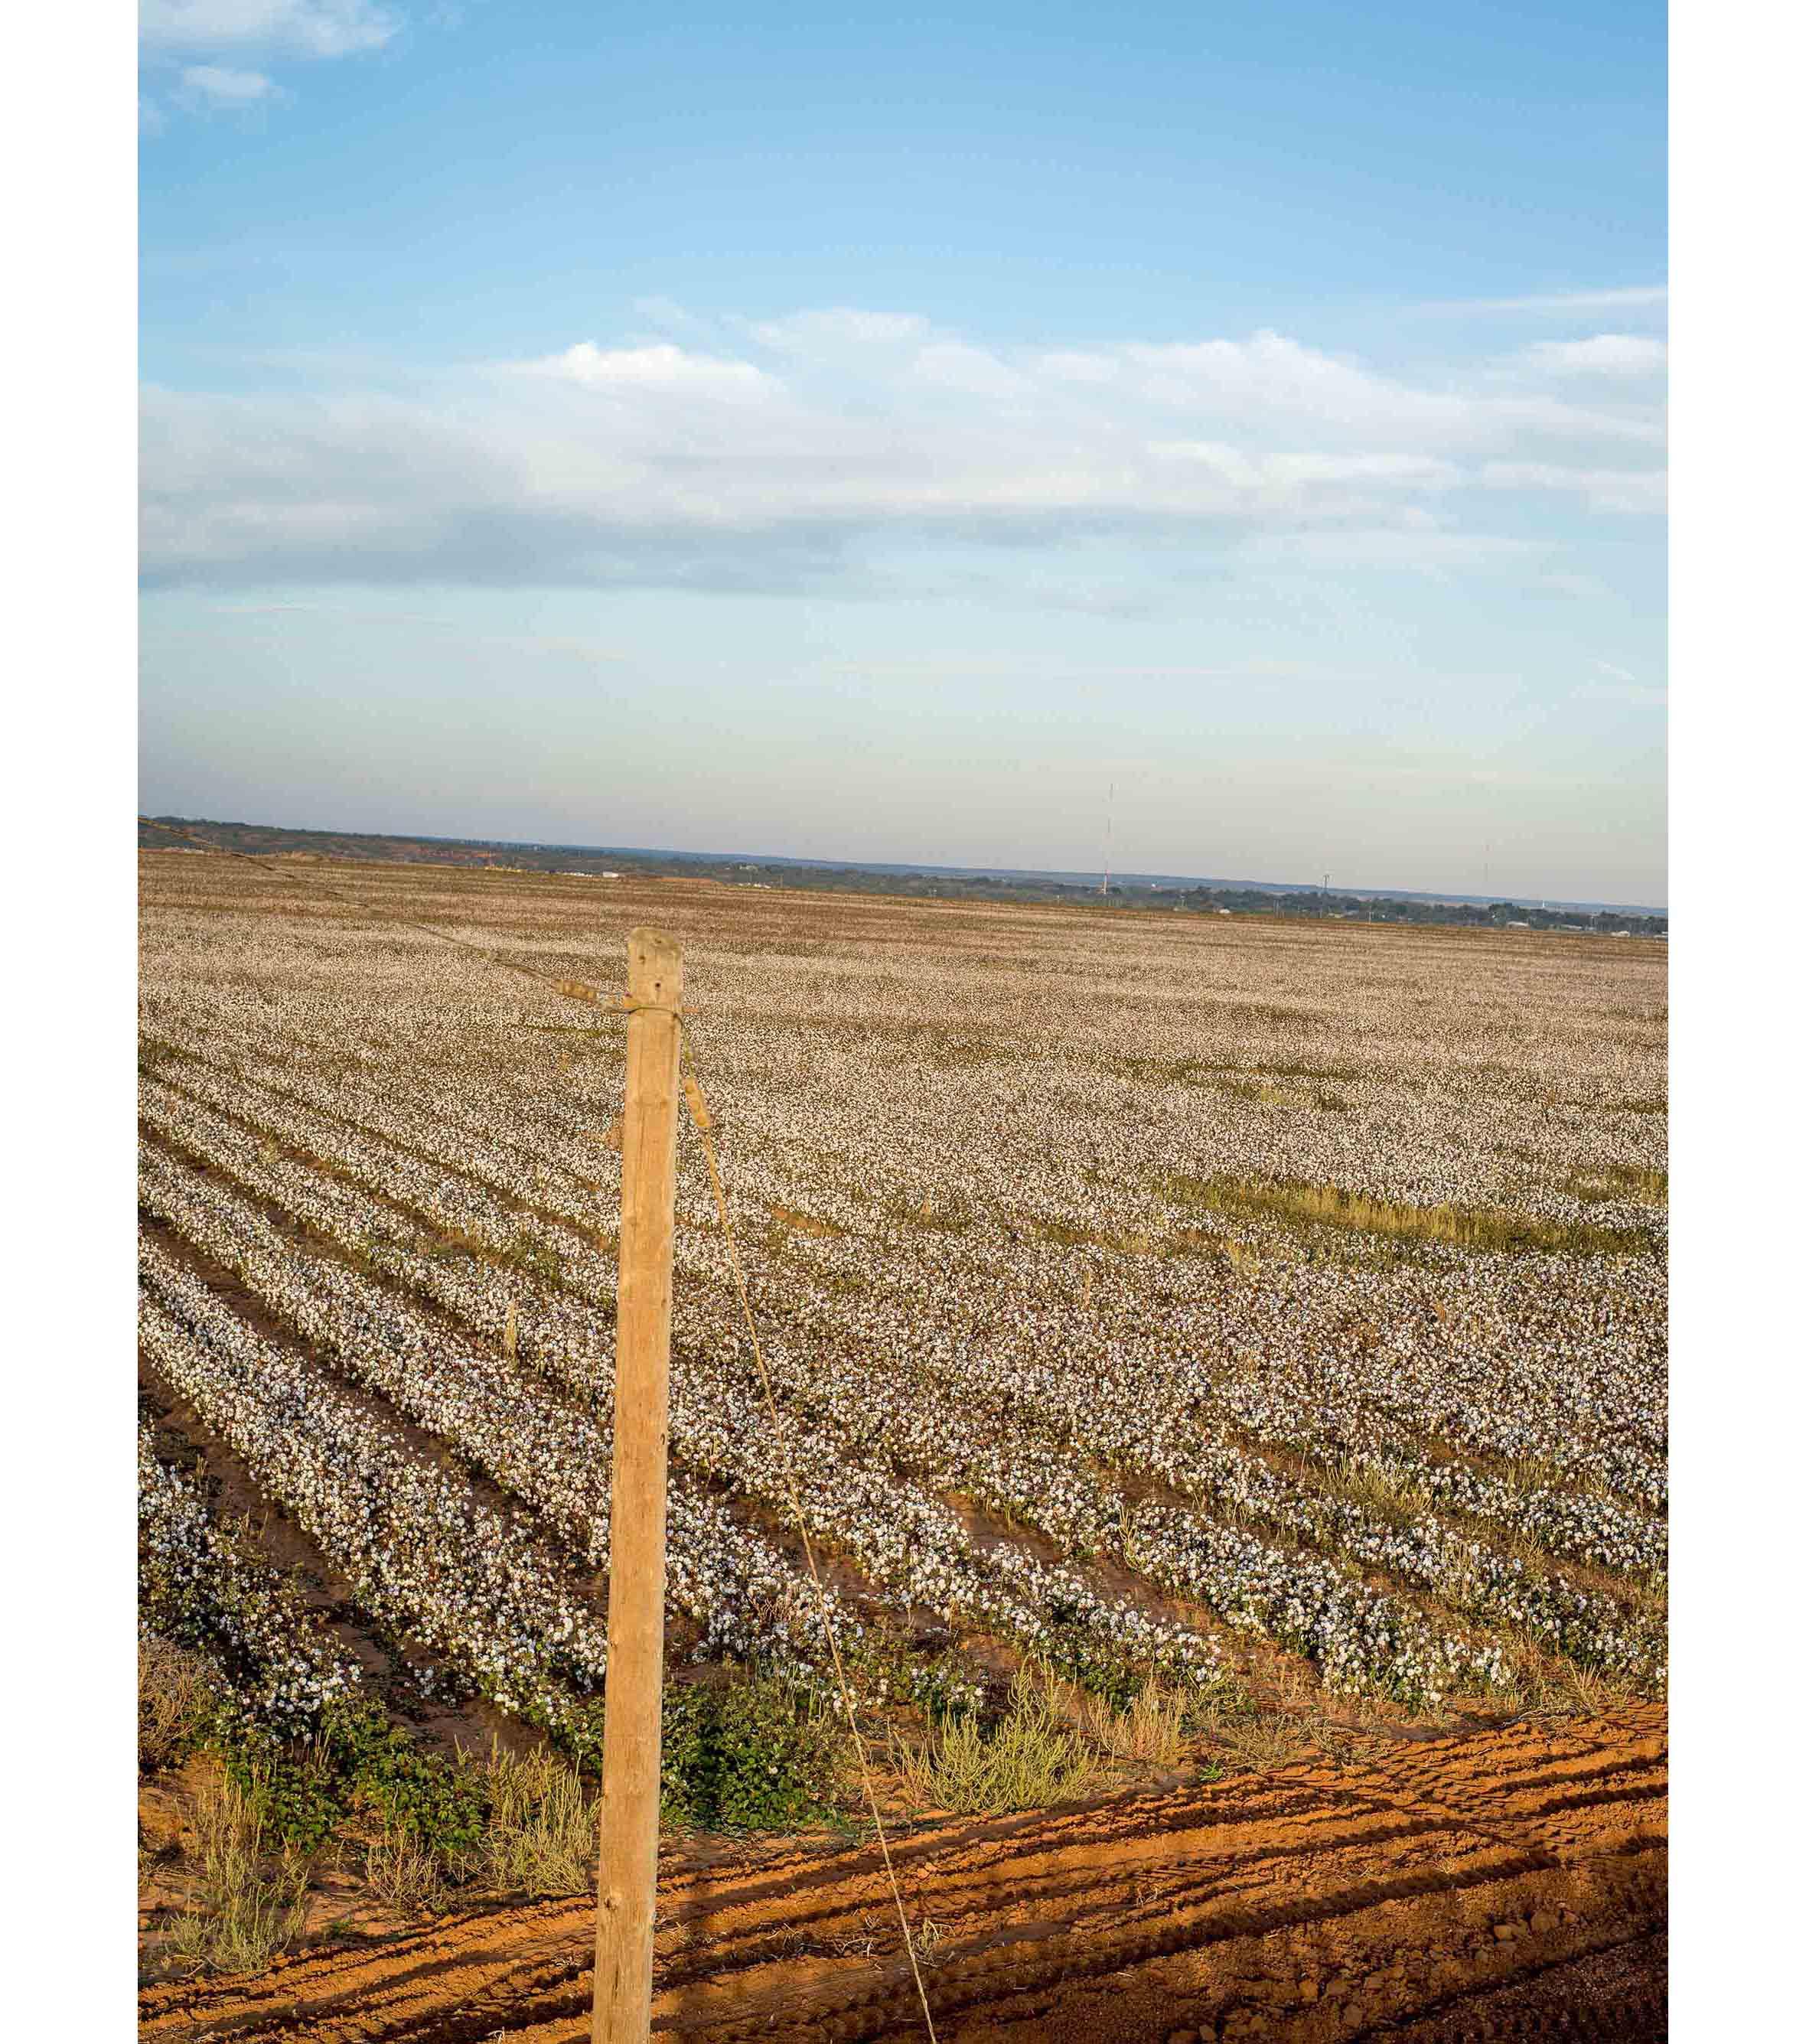 Cottonfields14.jpg